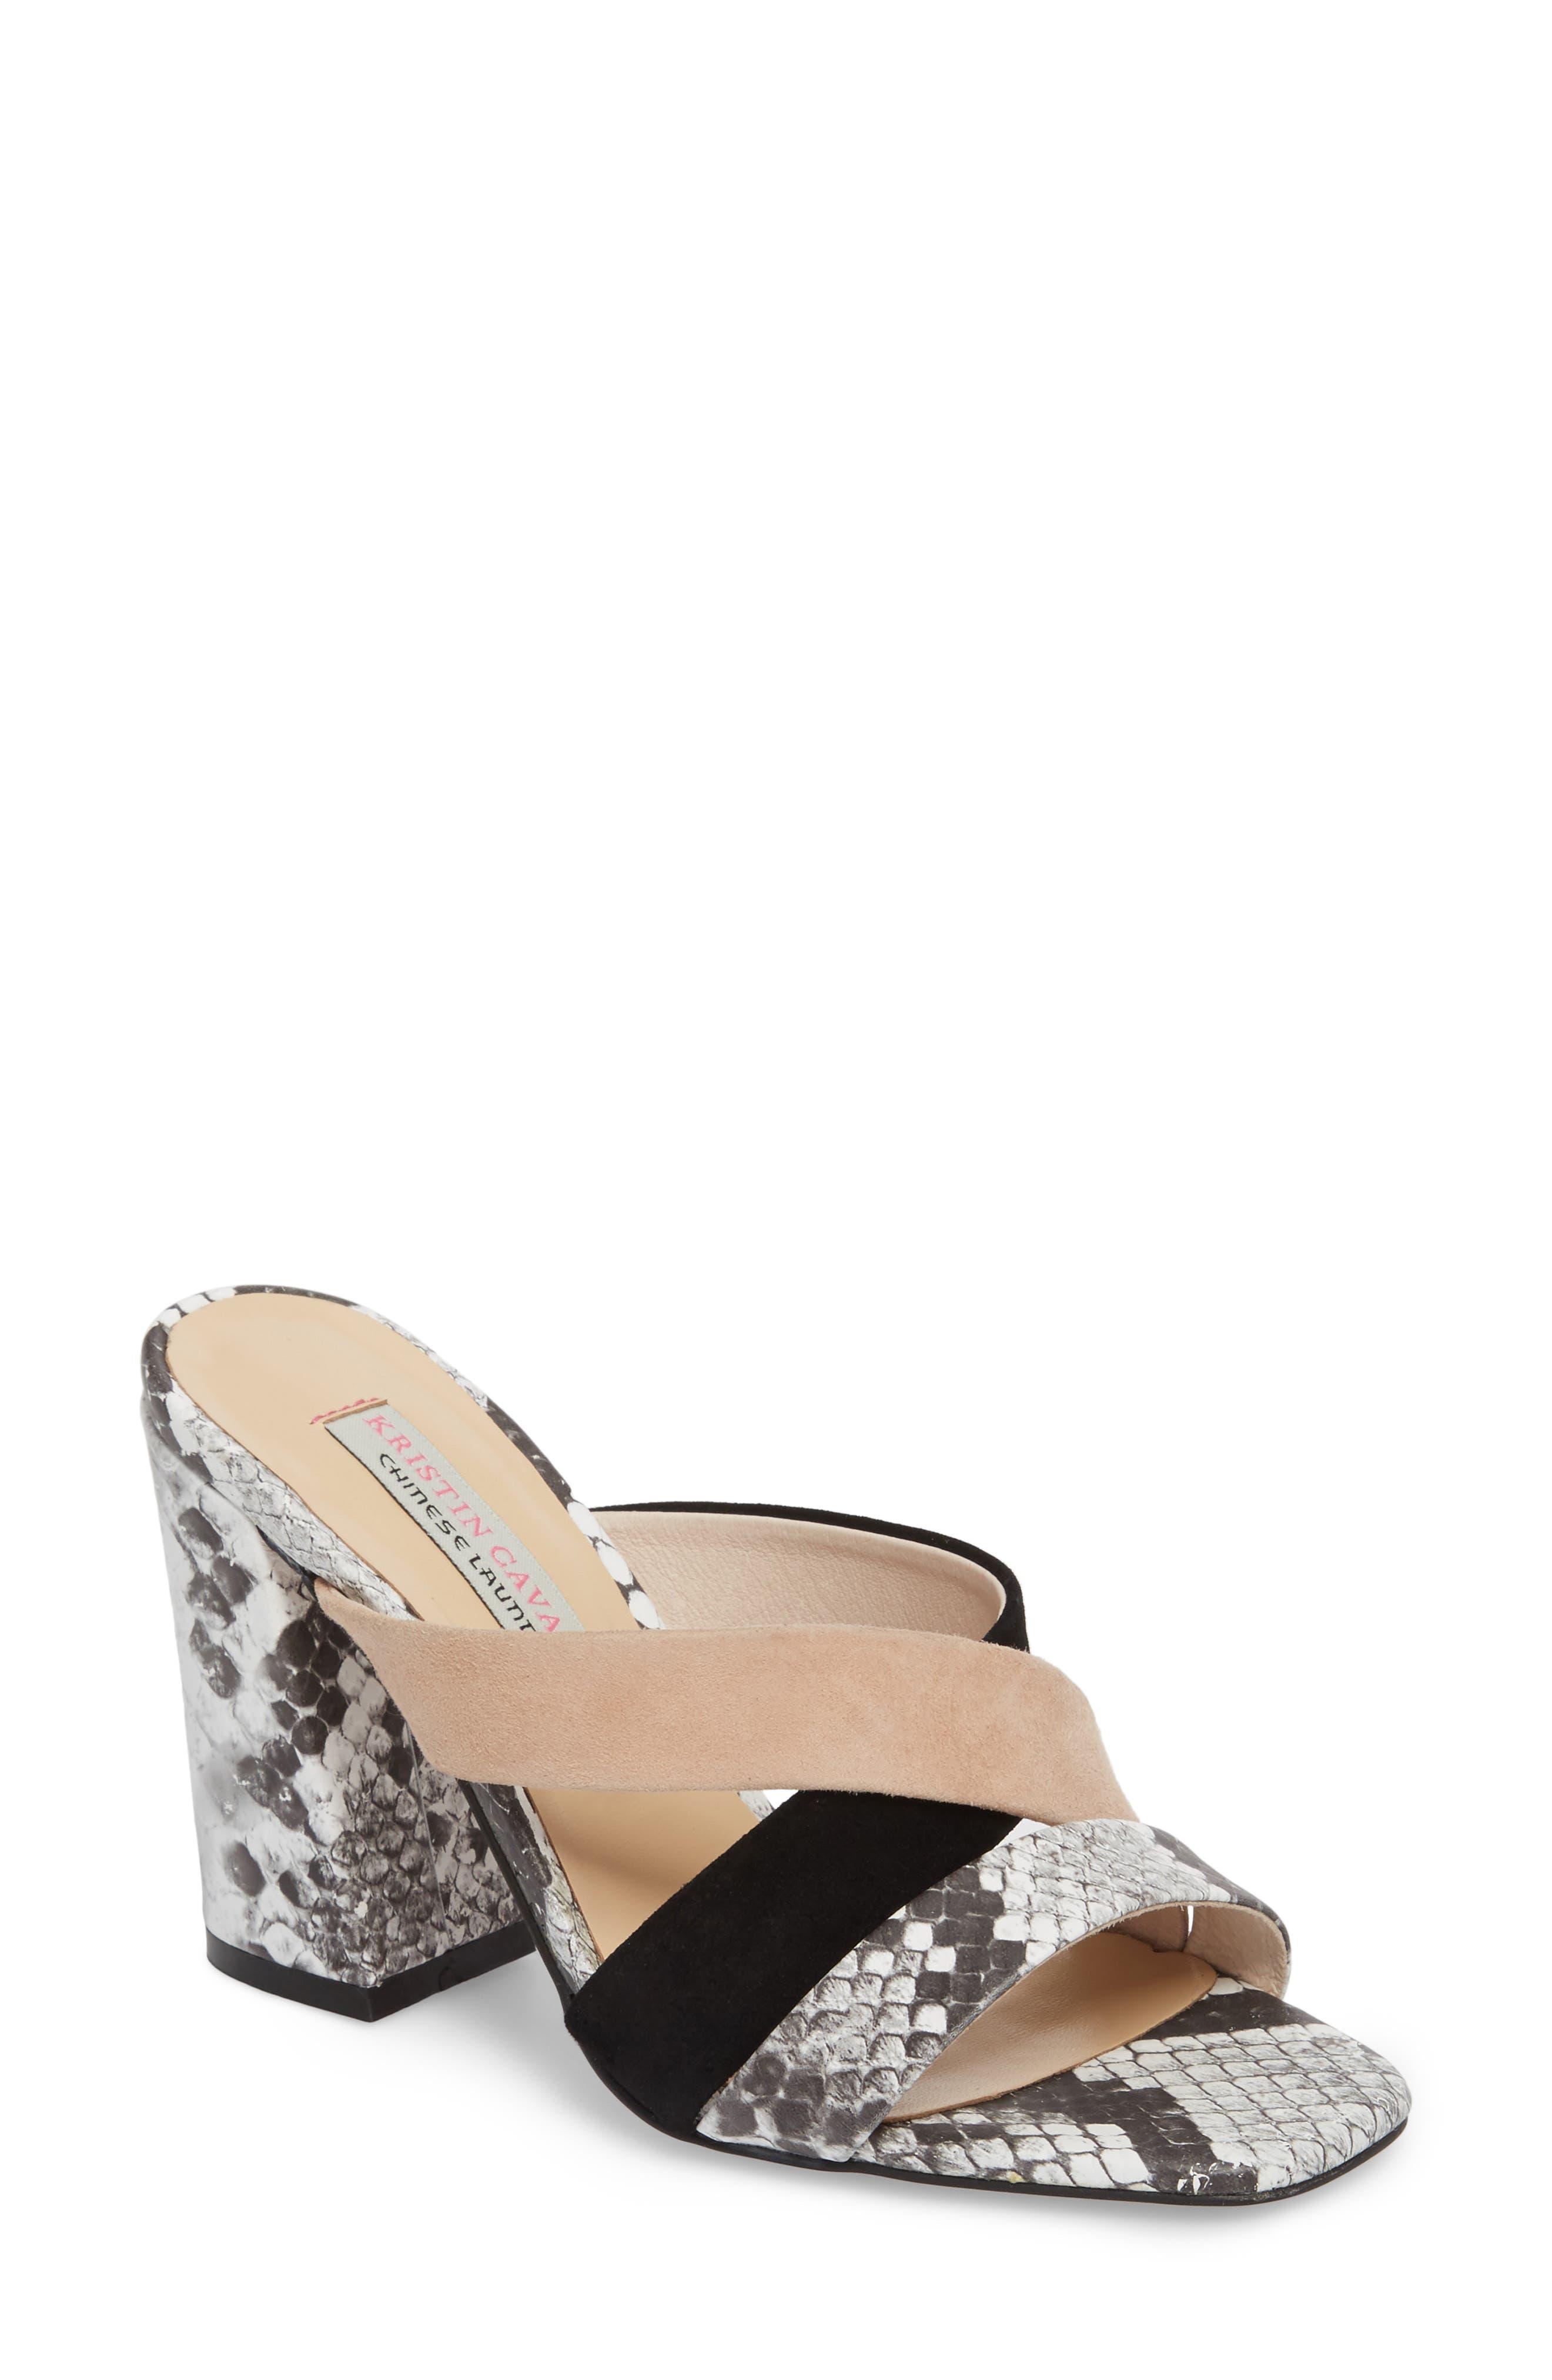 Lola Slide Sandal,                         Main,                         color, 025